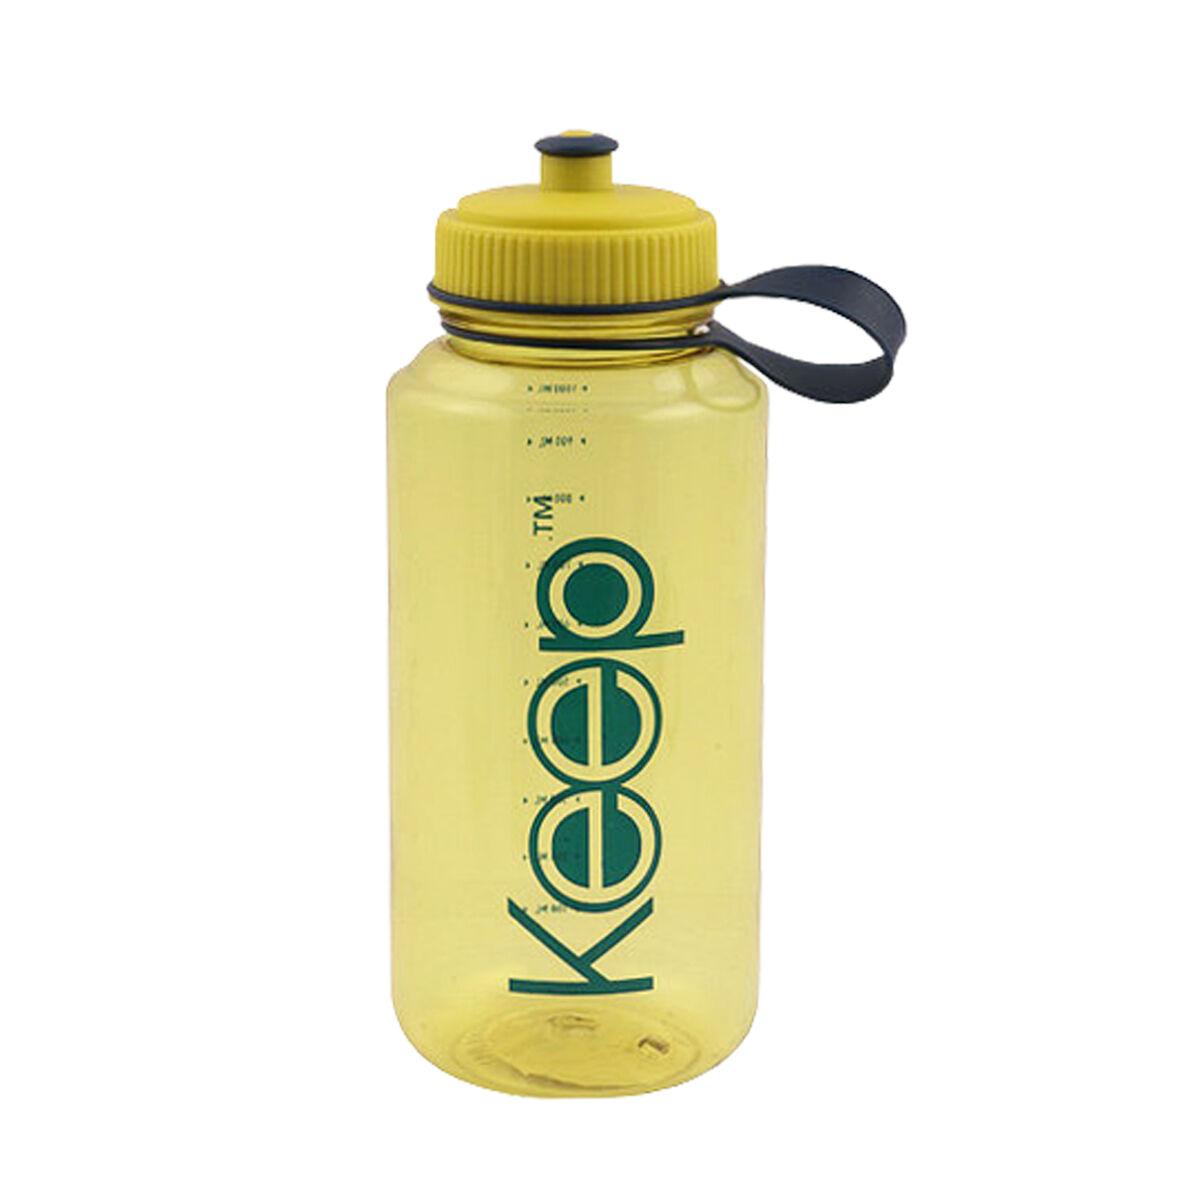 "Mochila Kensington SP25 15.6"" + Botella KEEP"